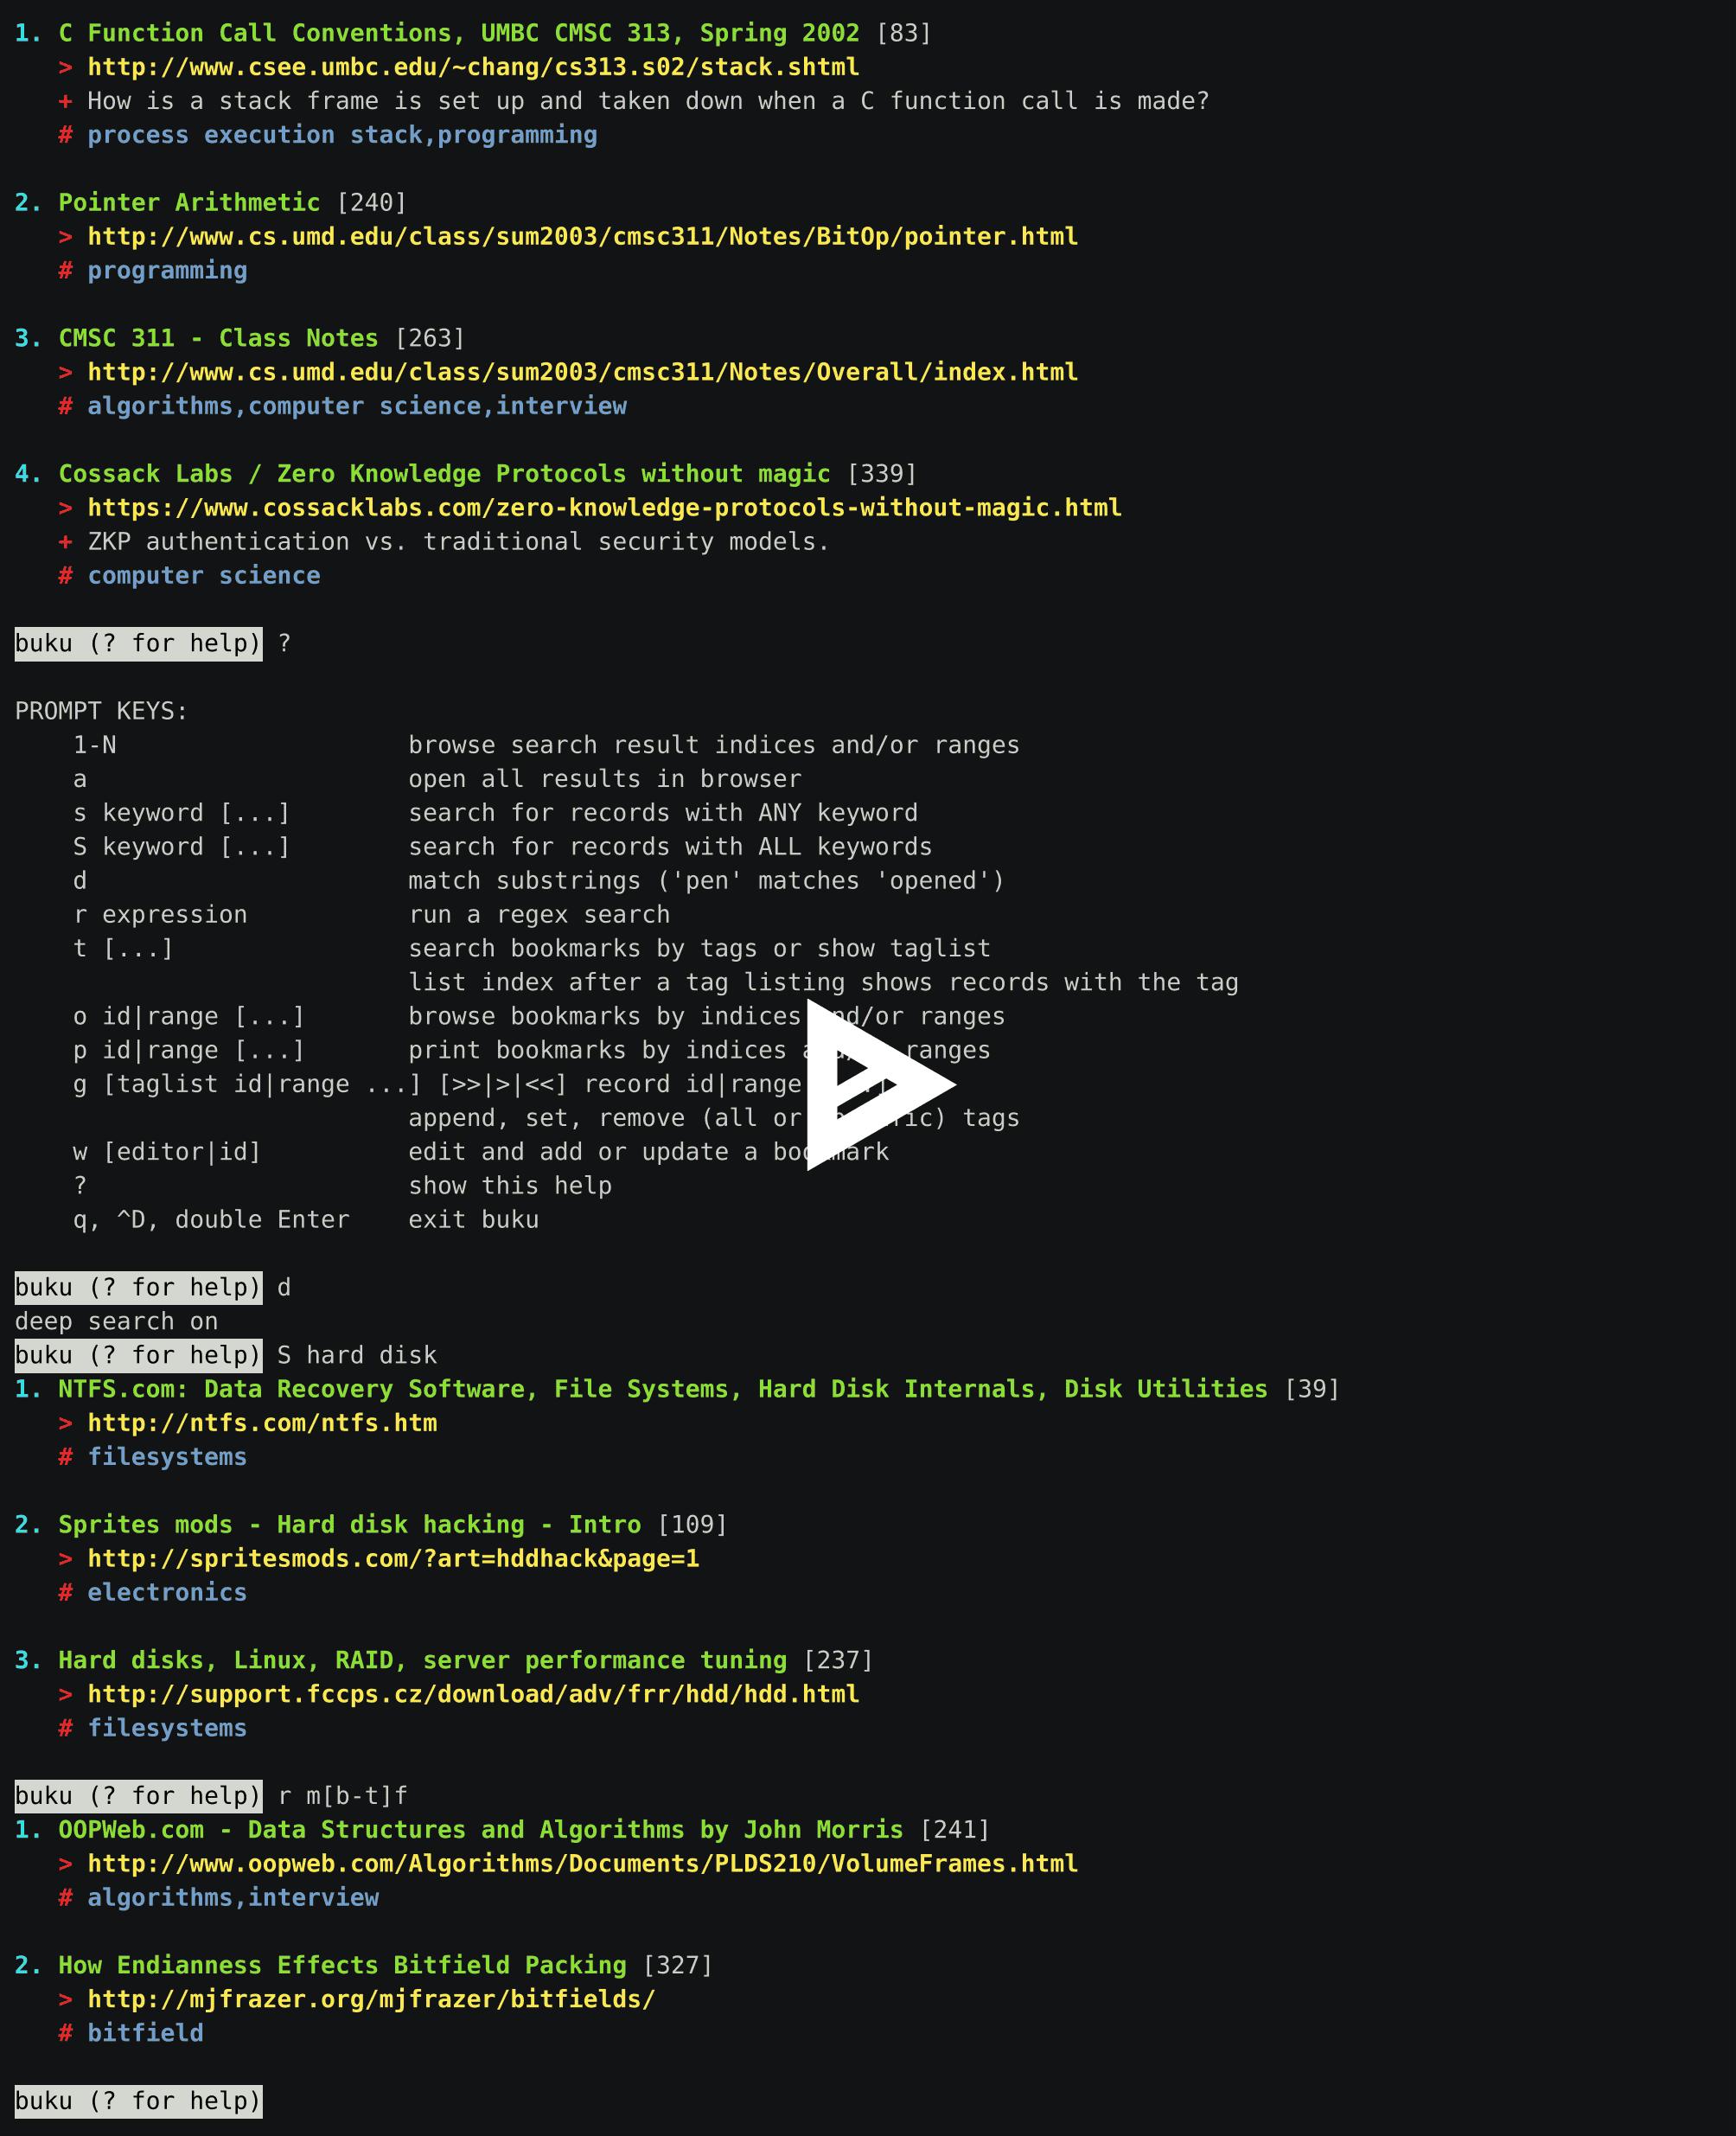 Buku/docs/source at master · jarun/Buku · GitHub